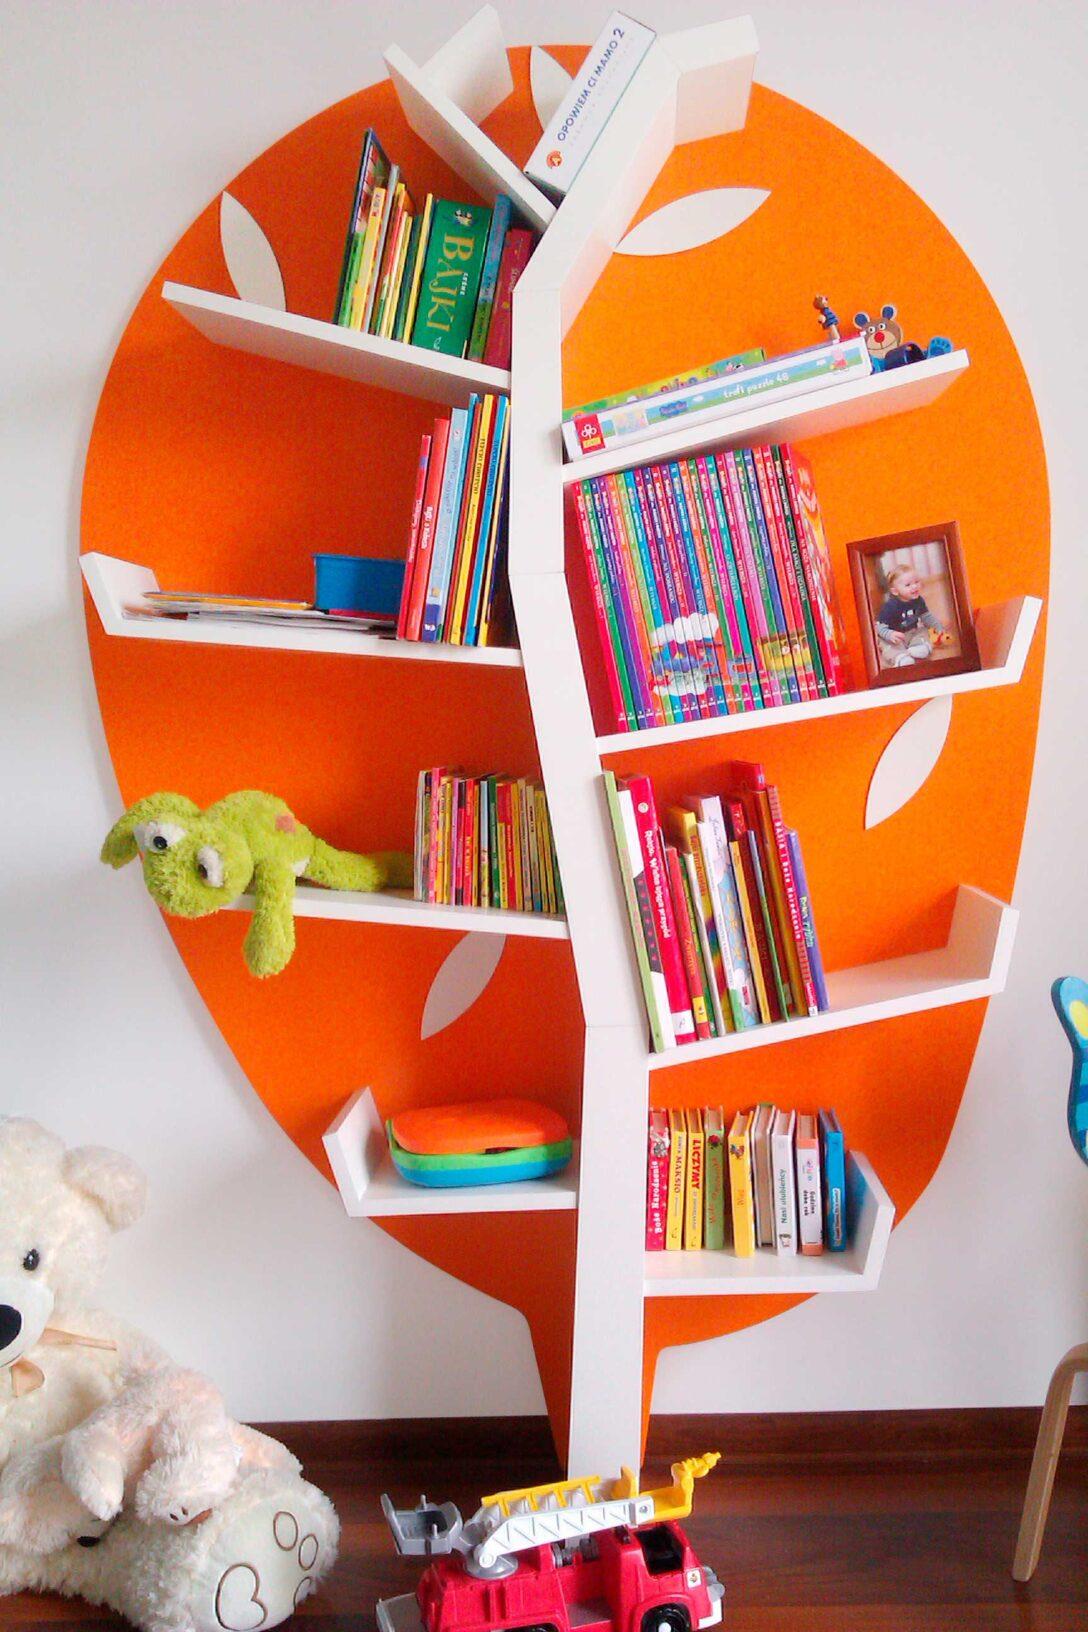 Large Size of Kinderzimmer Bücherregal Regale Regal Weiß Sofa Kinderzimmer Kinderzimmer Bücherregal